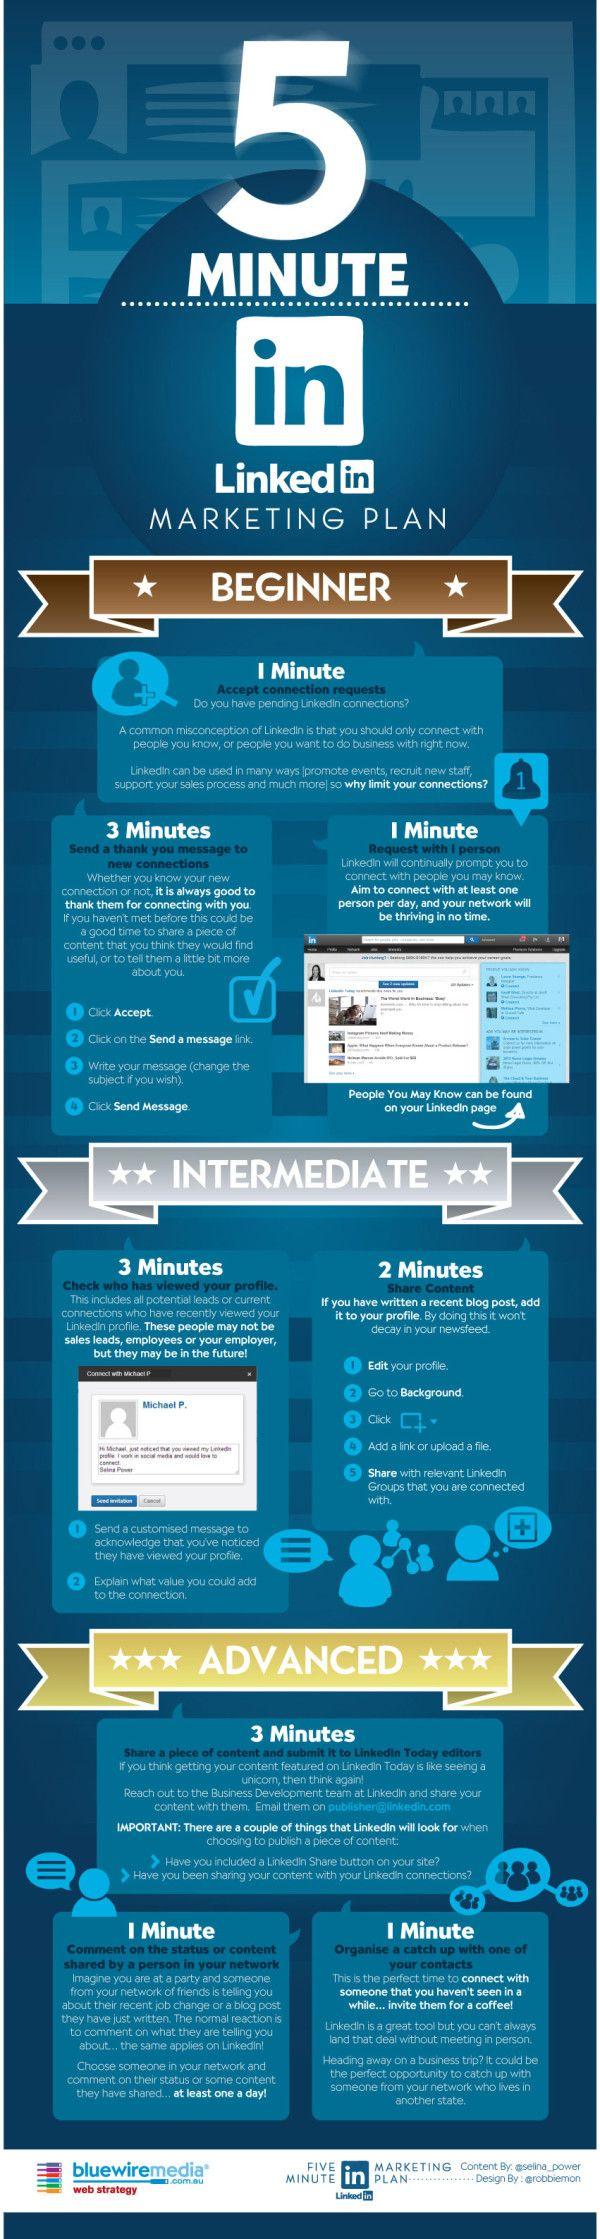 5 minute daily marketing plan to grow your LinkedIn network #linkedin #marketingtip #infographic